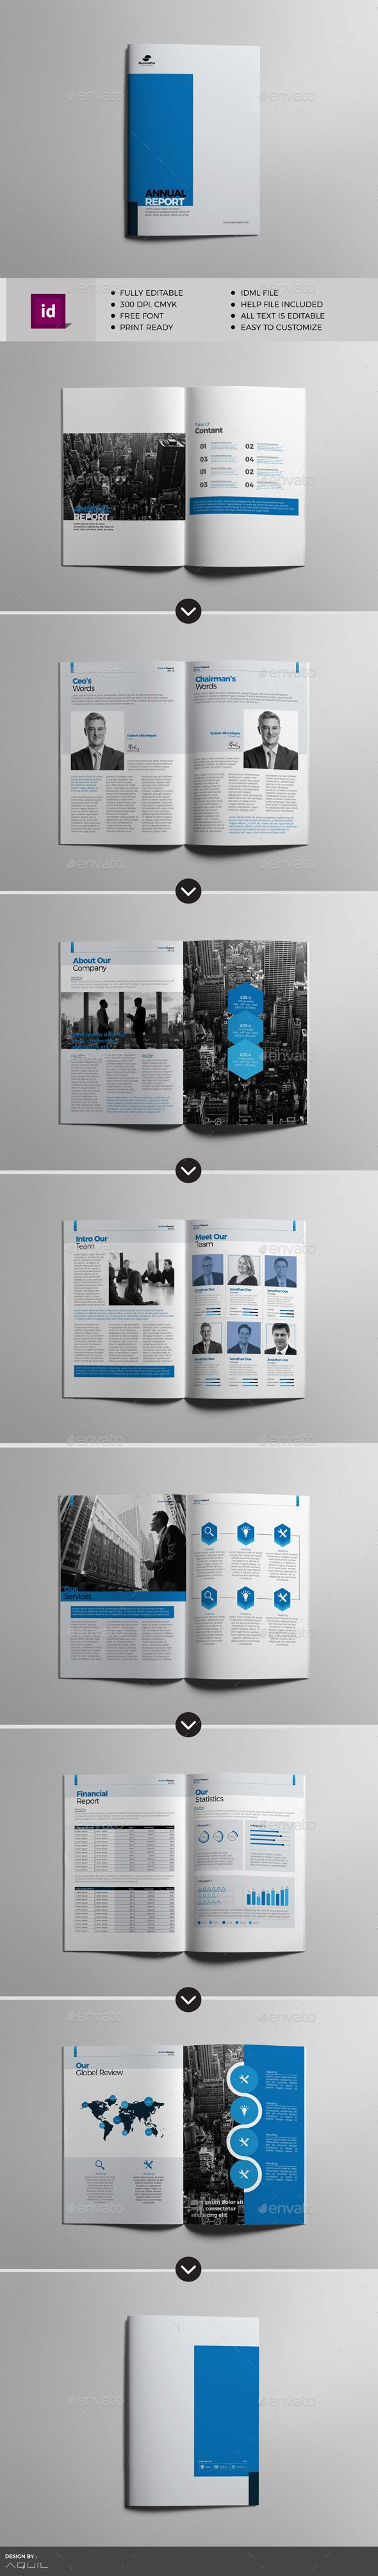 Annual Report — #company brochure #design • Download ➝ https://graphicriver.net/item/annual-report/21220226?ref=pxcr